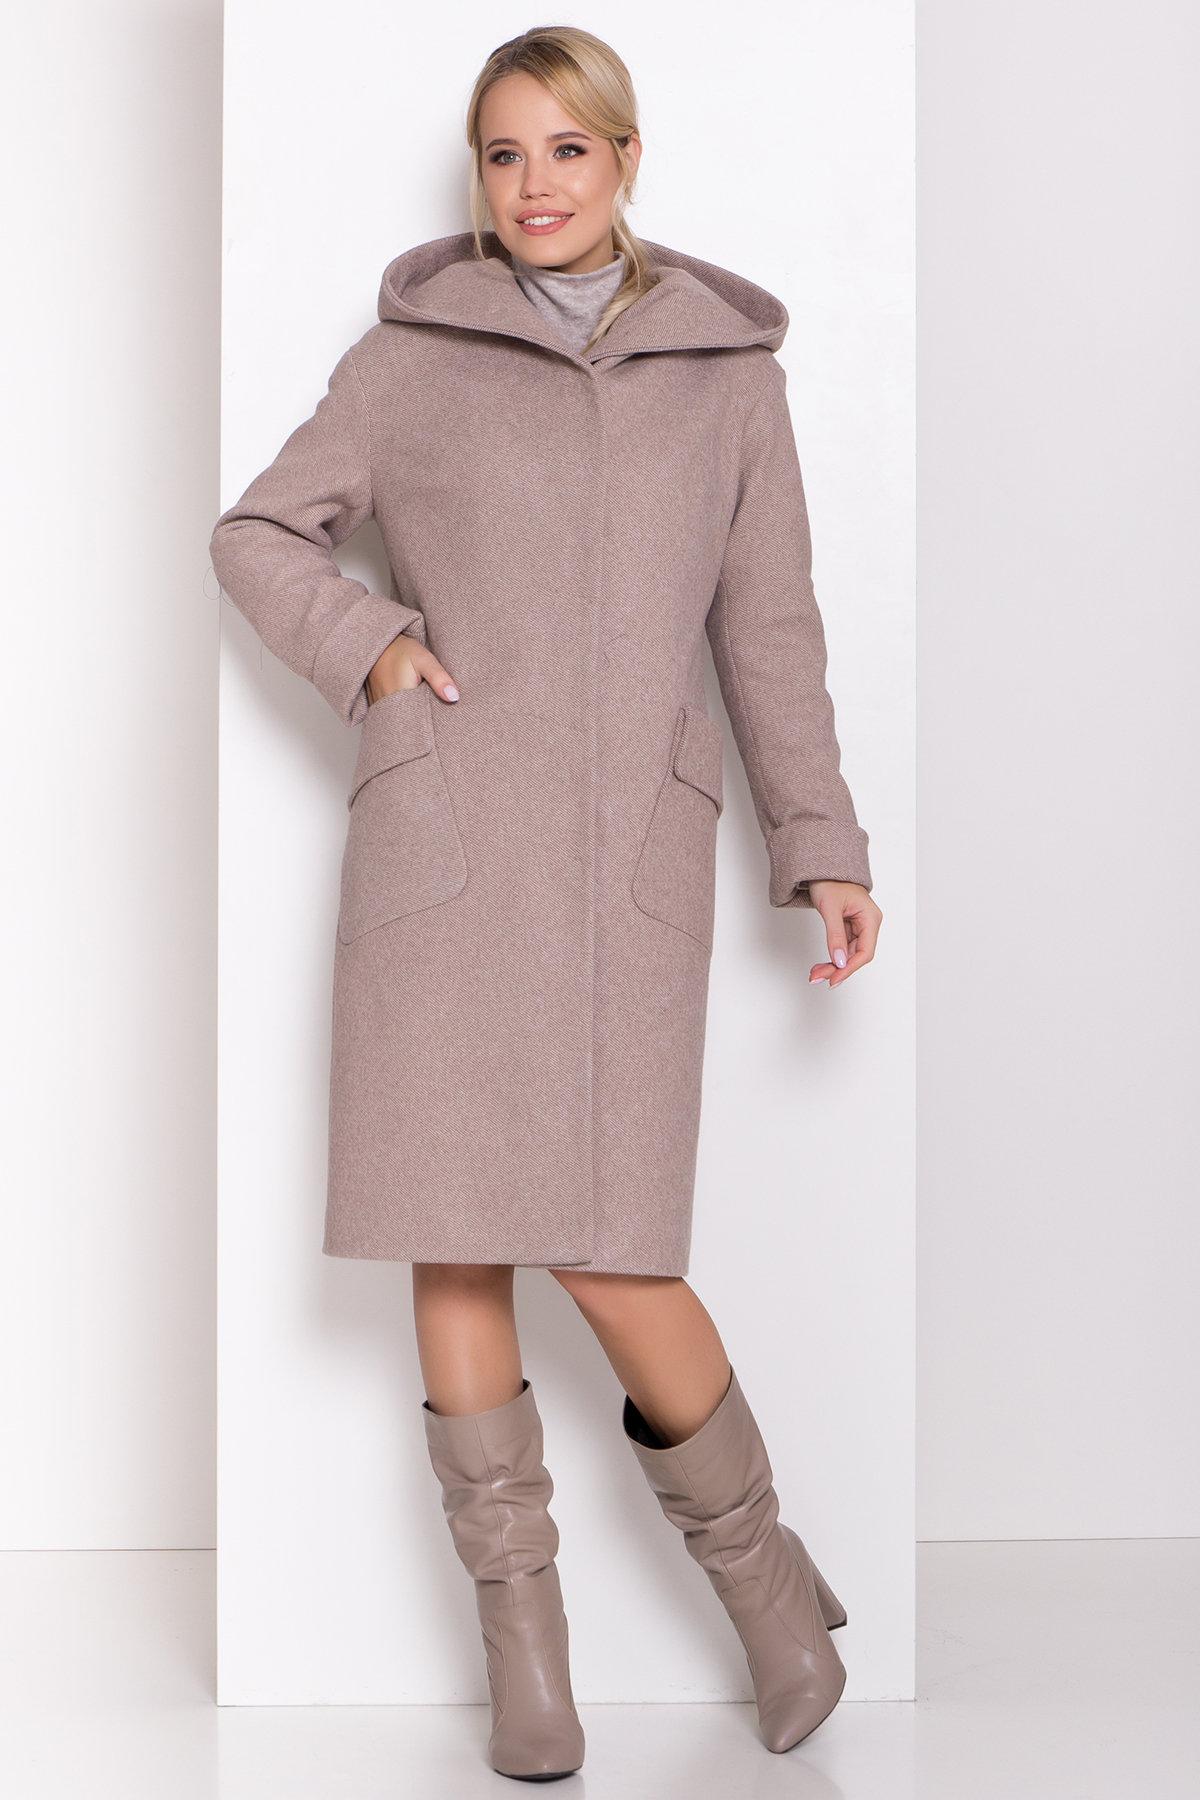 Пальто зима Анджи 8455 АРТ. 44727 Цвет: Бежевый меланж - фото 3, интернет магазин tm-modus.ru